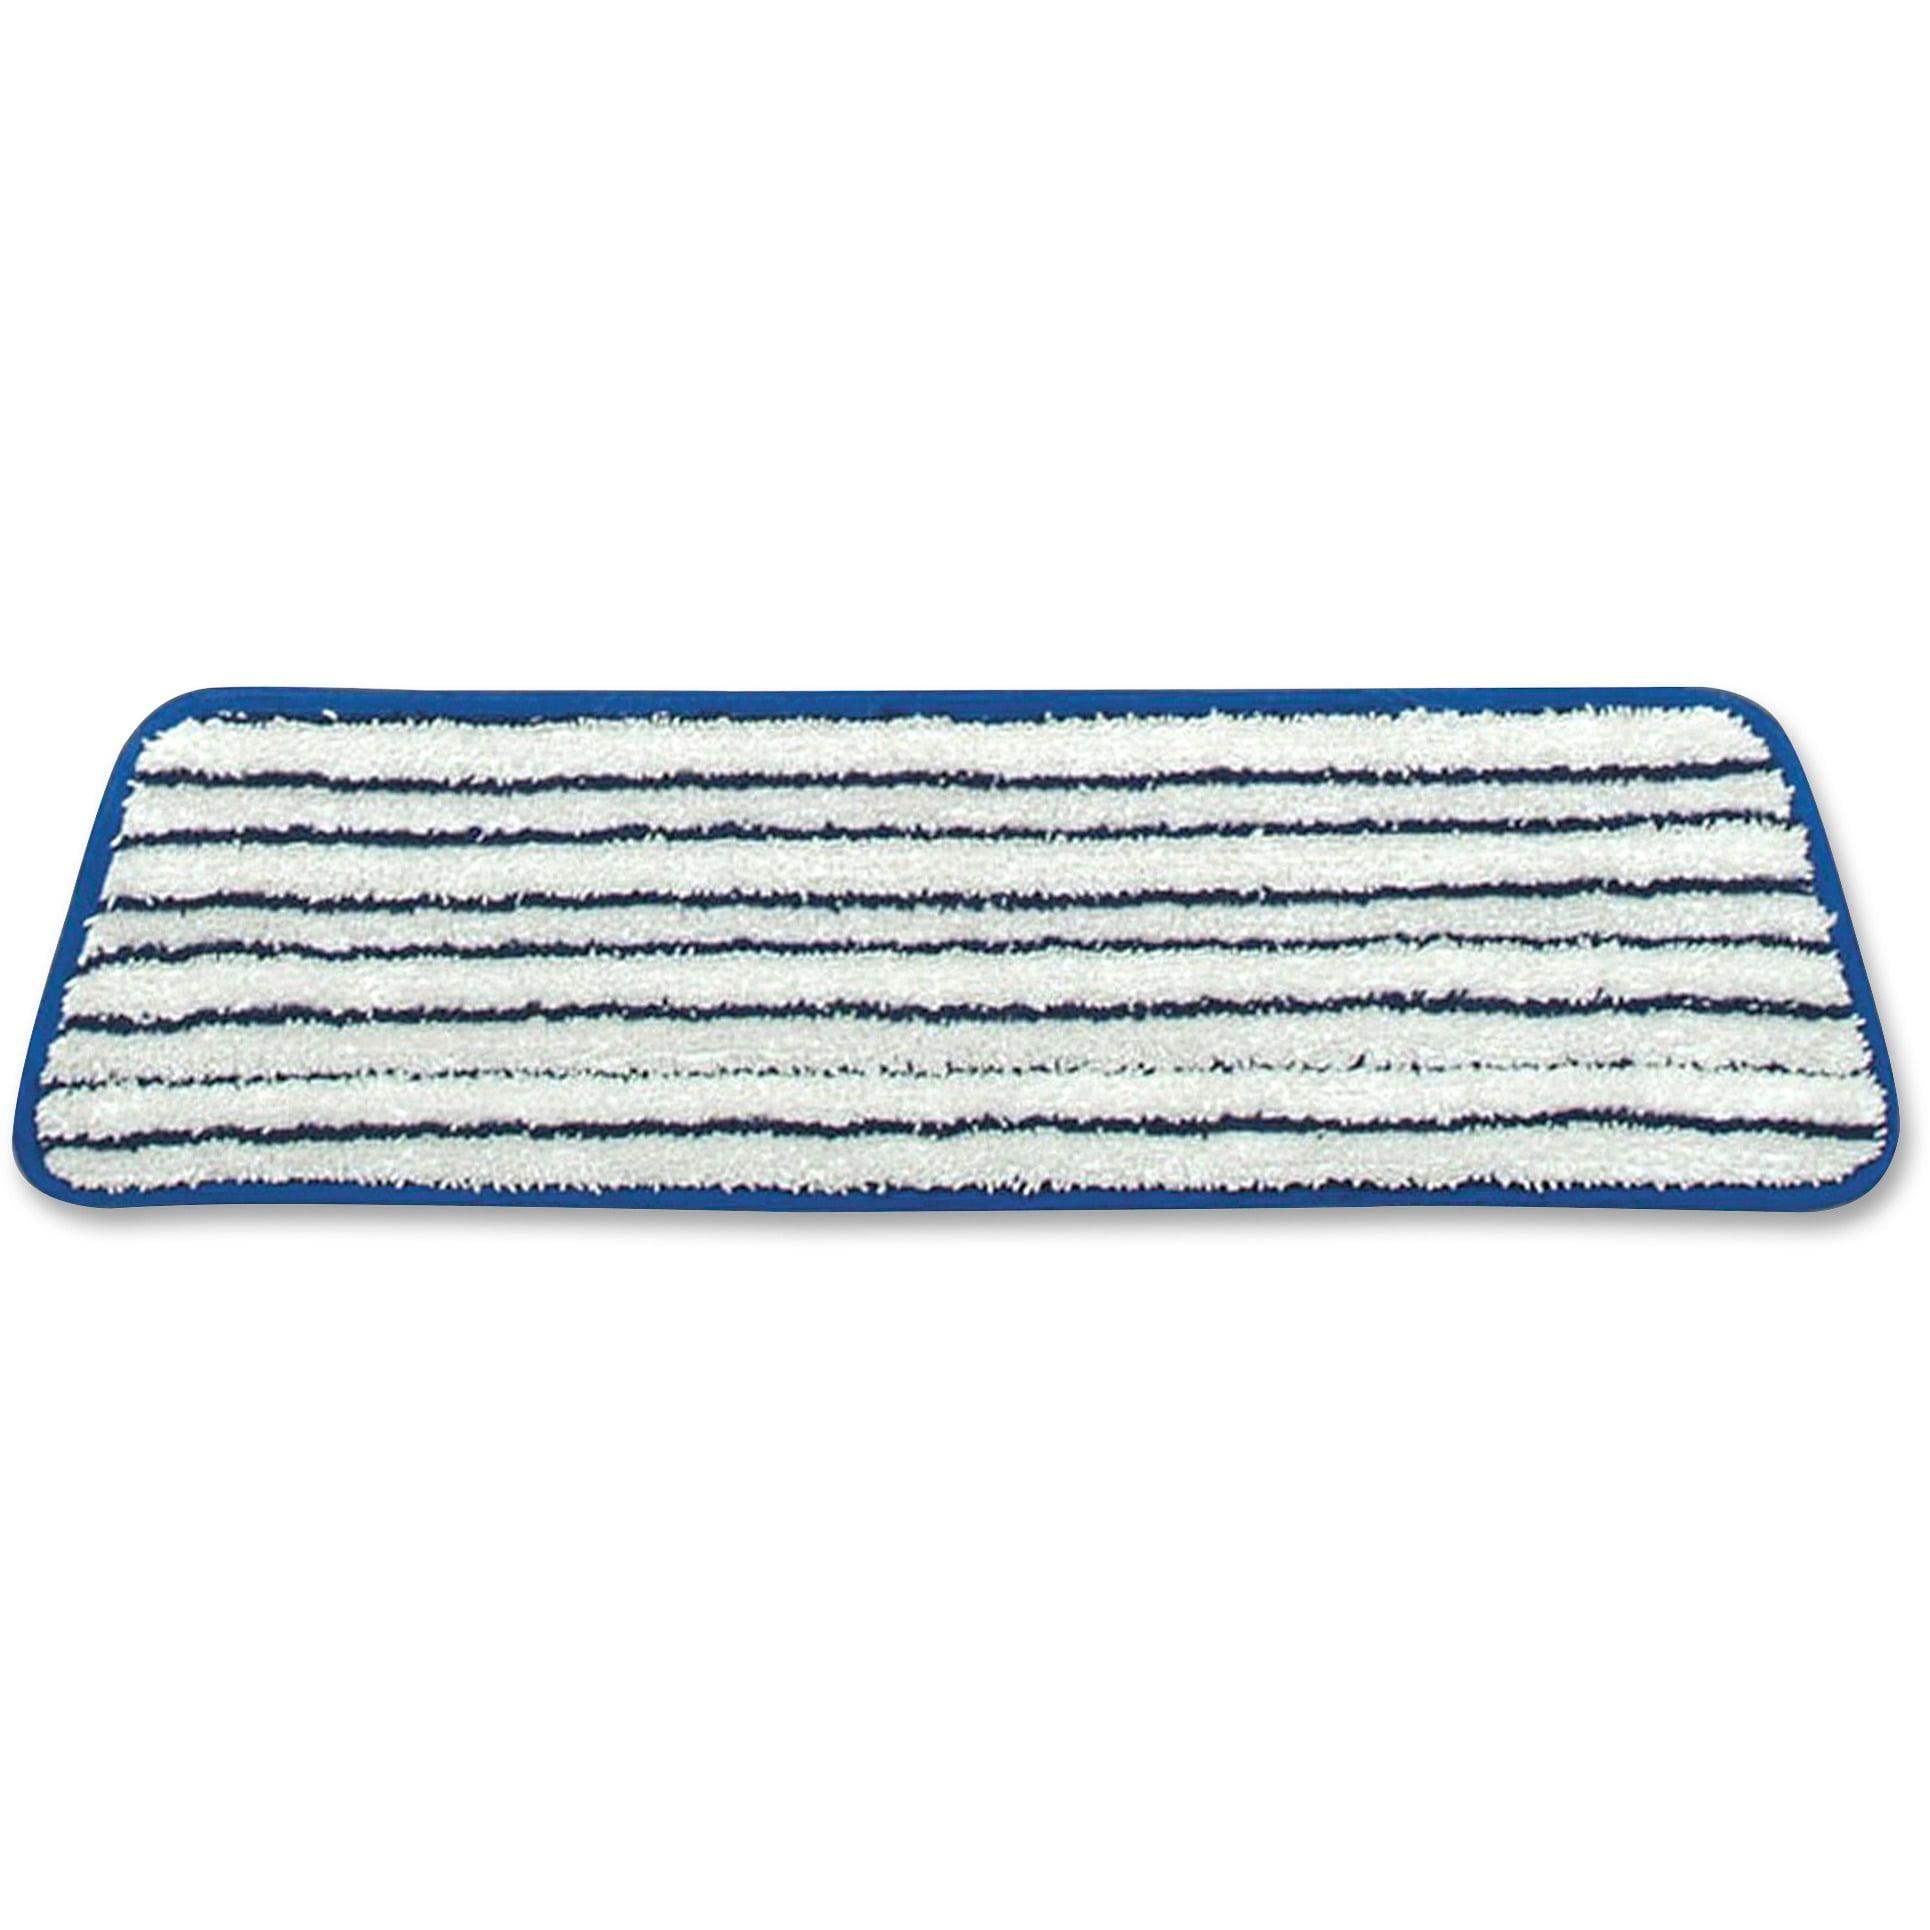 "Rubbermaid Commercial, RCPQ800WHI, 18"" Microfiber Finish Mop, 6 / Carton, Blue & White"